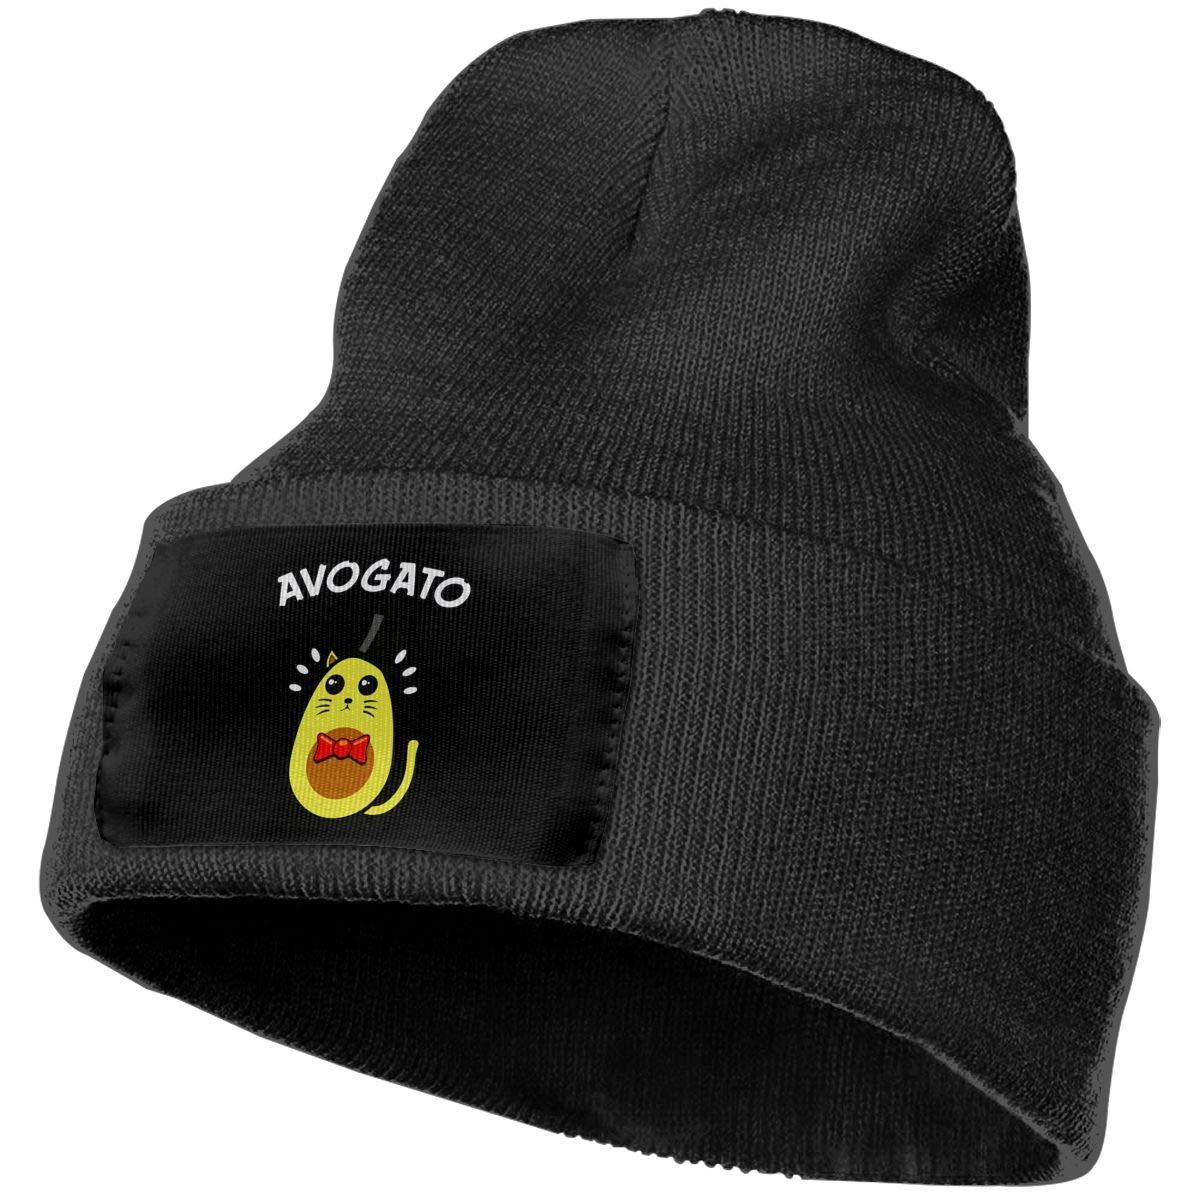 Men /& Women AVO-Gato Avocado Cat Outdoor Stretch Knit Beanies Hat Soft Winter Skull Caps